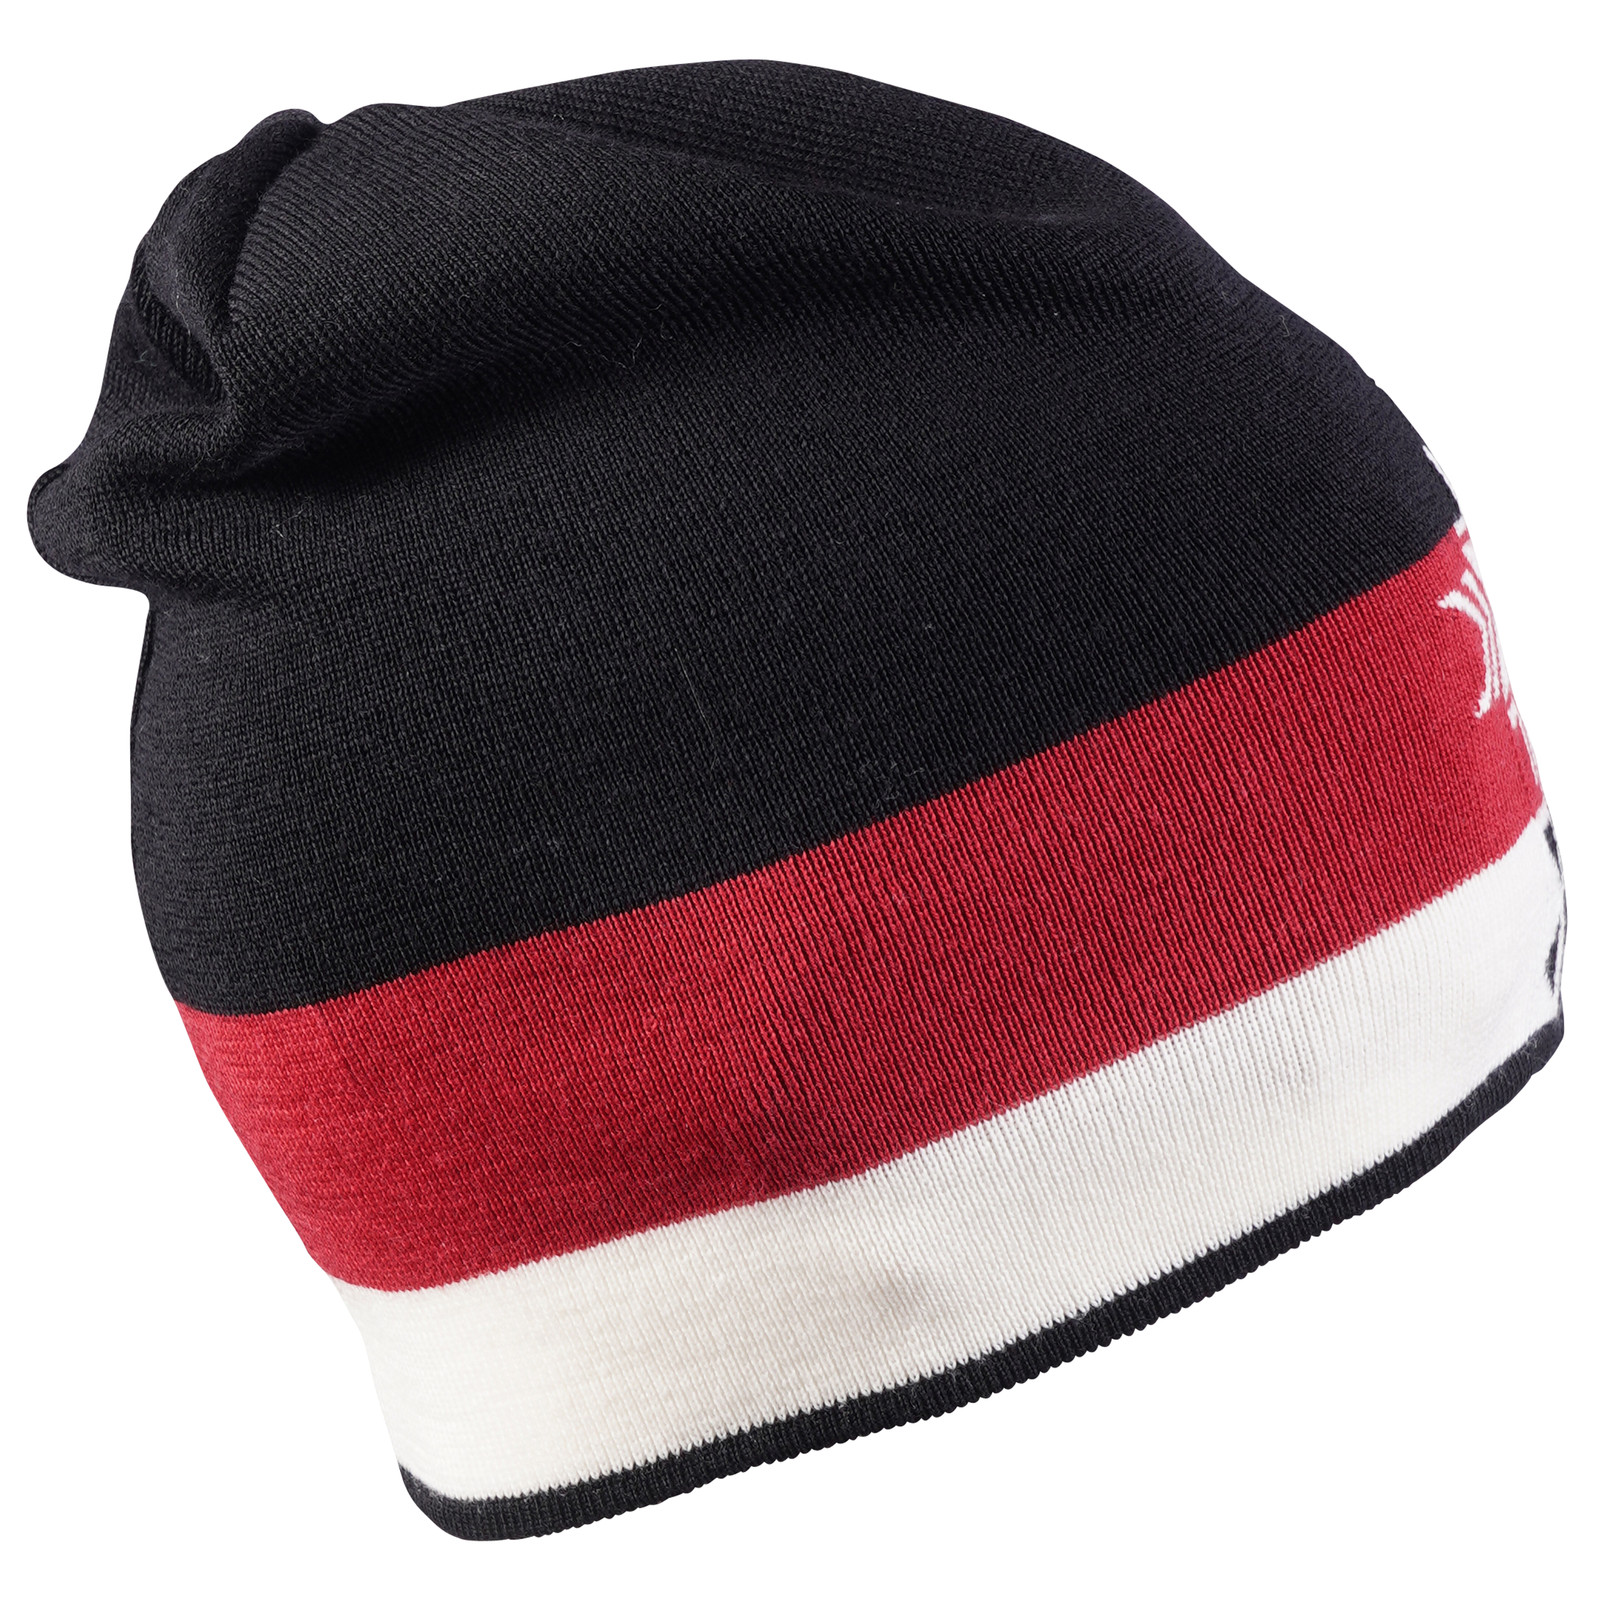 Dale of Norway Geilolia Hat - Black/Raspberry/Off White, 48261-F